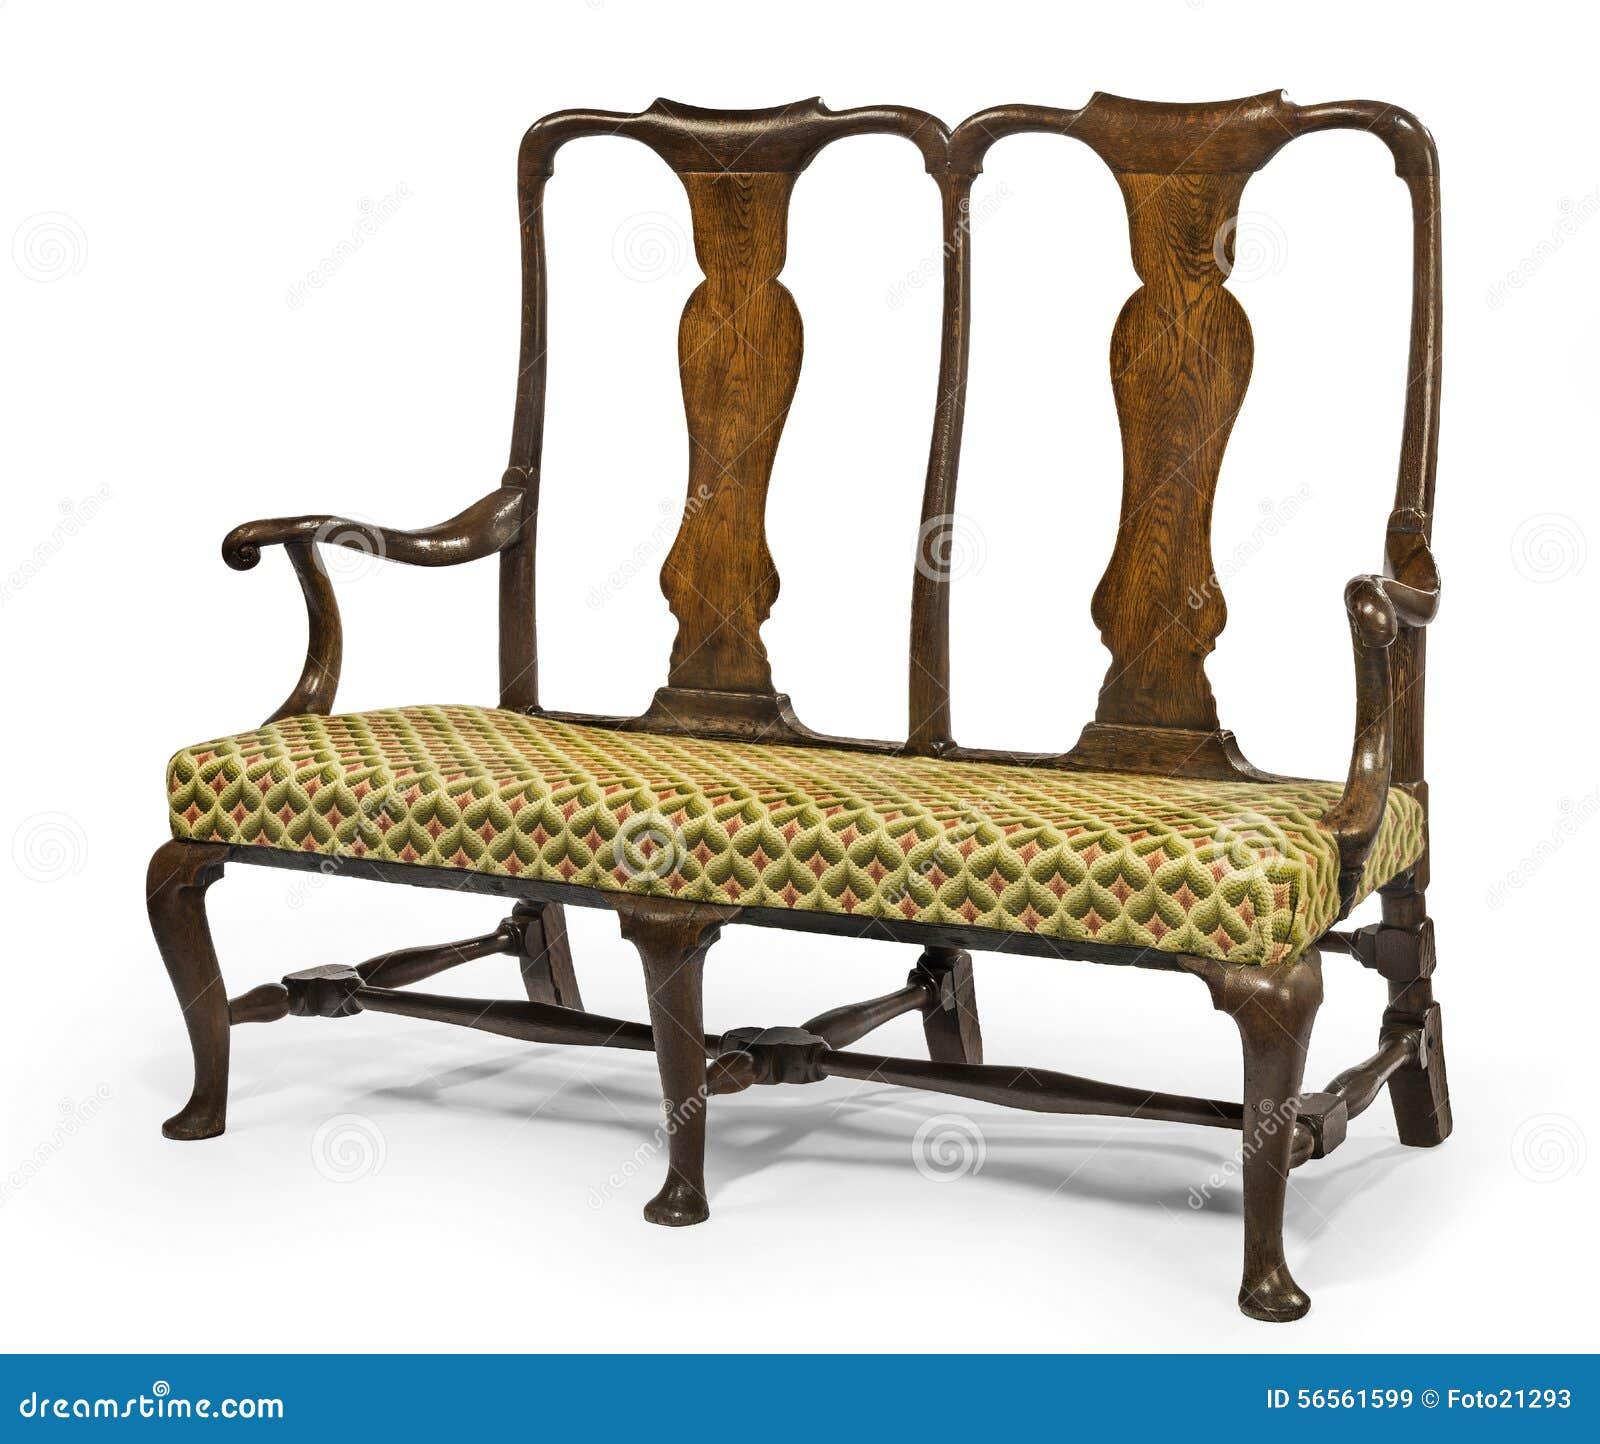 Download Καναπές 2 ξύλινη πλαισιωμένη το En φωτεινή ταπετσαρία καναπέδων Seater Στοκ Εικόνα - εικόνα από μαξιλάρι, δύο: 56561599